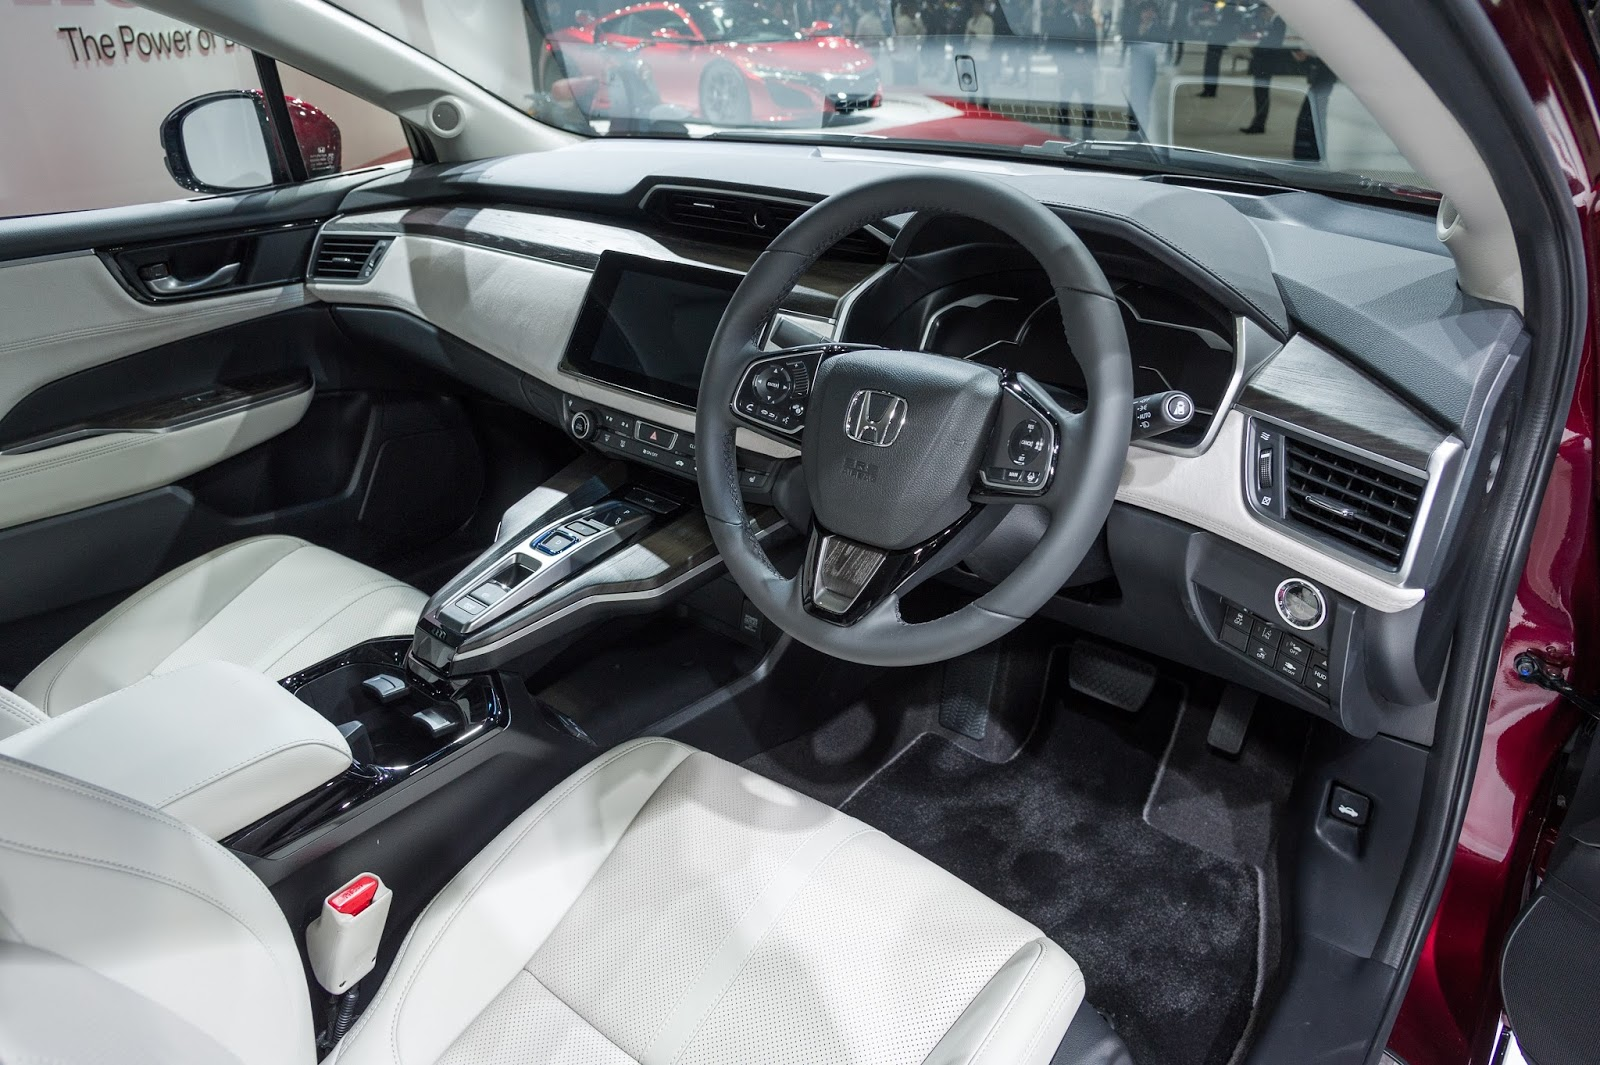 Honda%2BClarity%2BFuel%2Bcell%25282%2529 H Honda φέρνει στην Ευρώπη την απάντησή της στο Mirai Honda, Honda Clarity Fuel Cell, κυψέλες καυσίμου, υδρογόνο